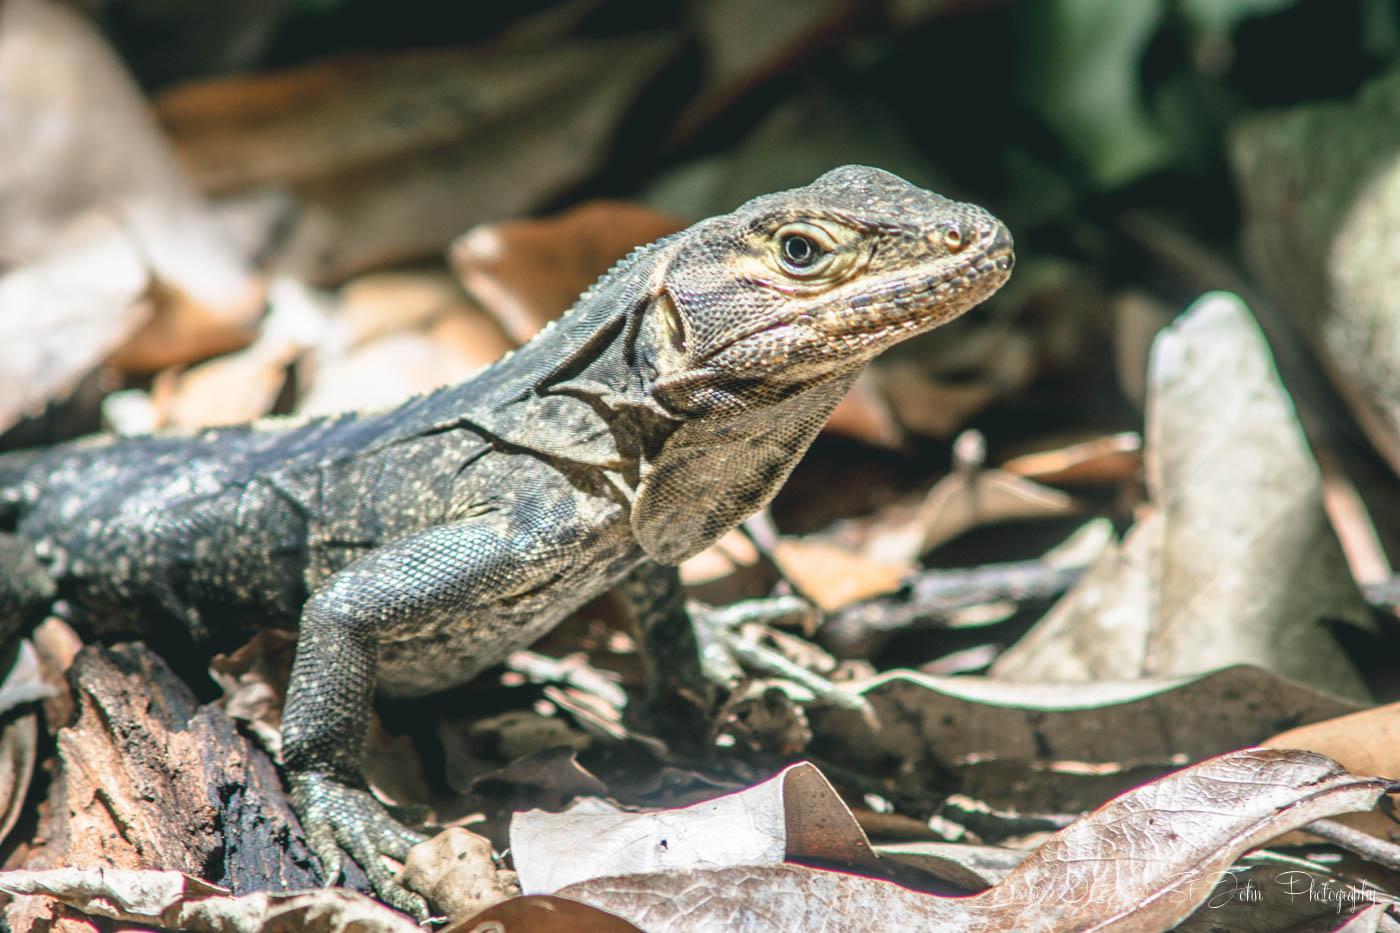 Manuel Antonio National Park: